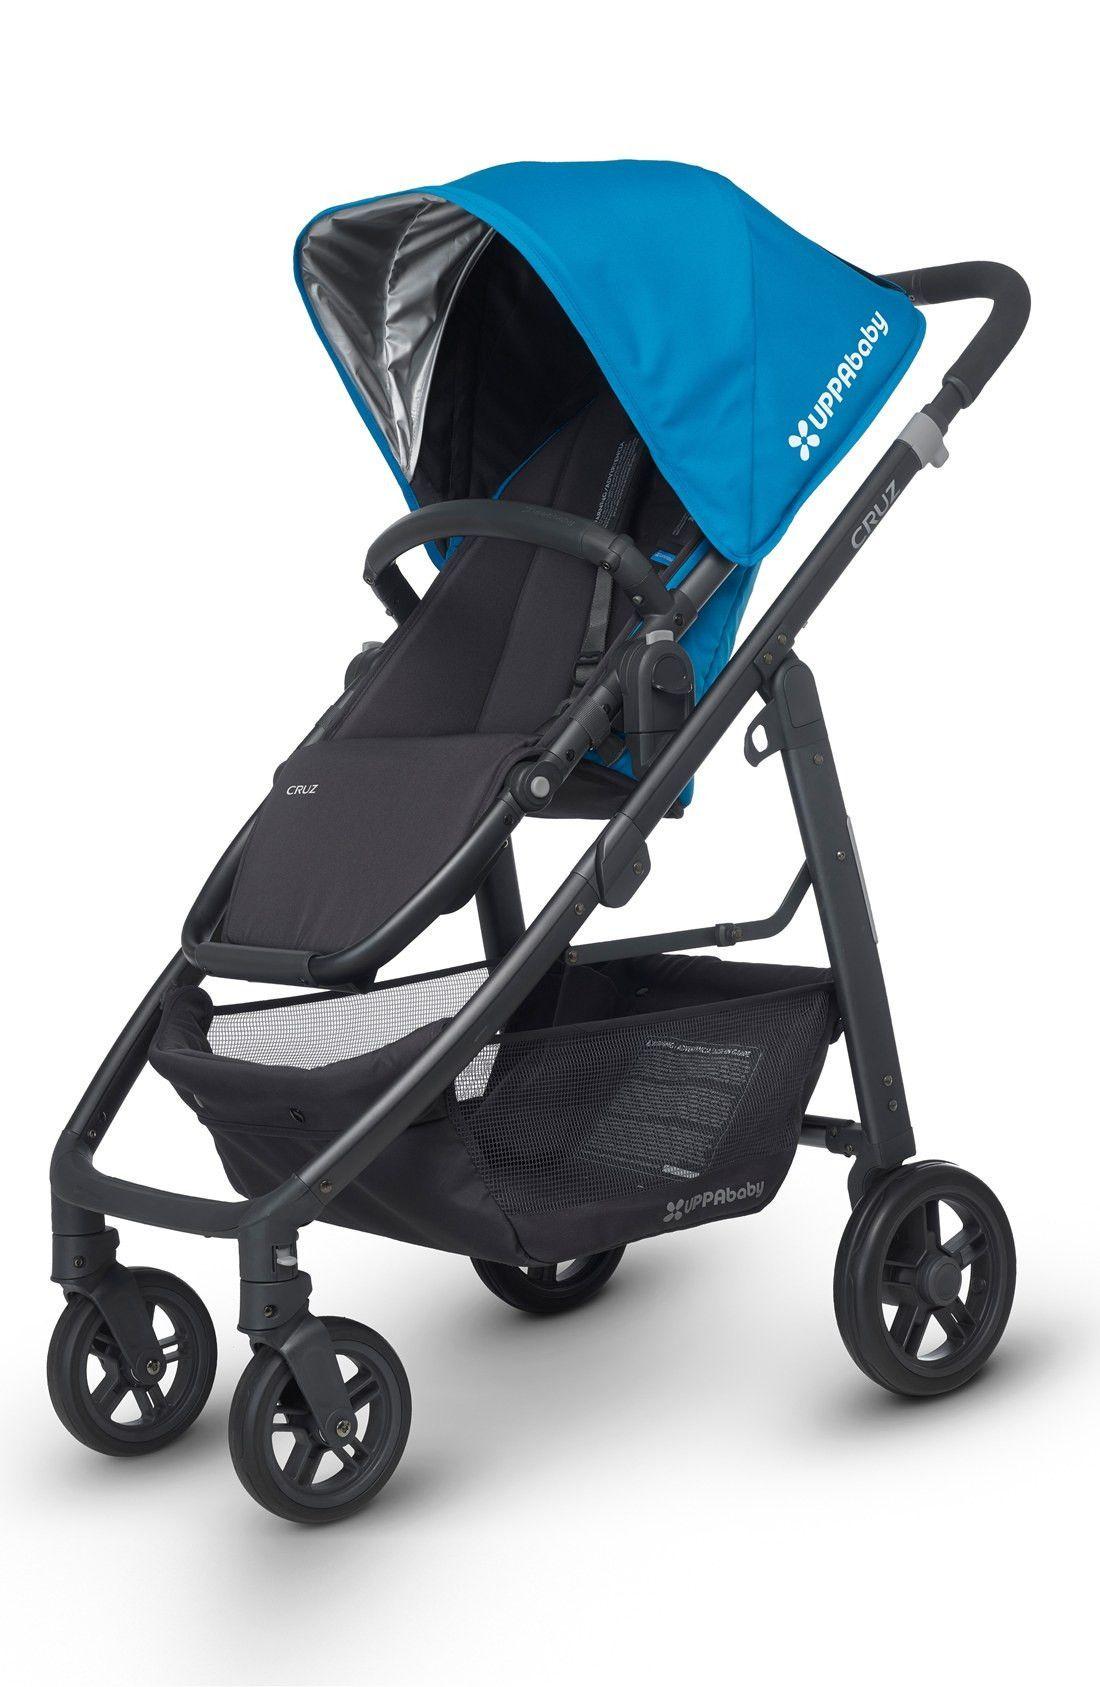 2015 CRUZ Black Frame Stroller Uppababy stroller